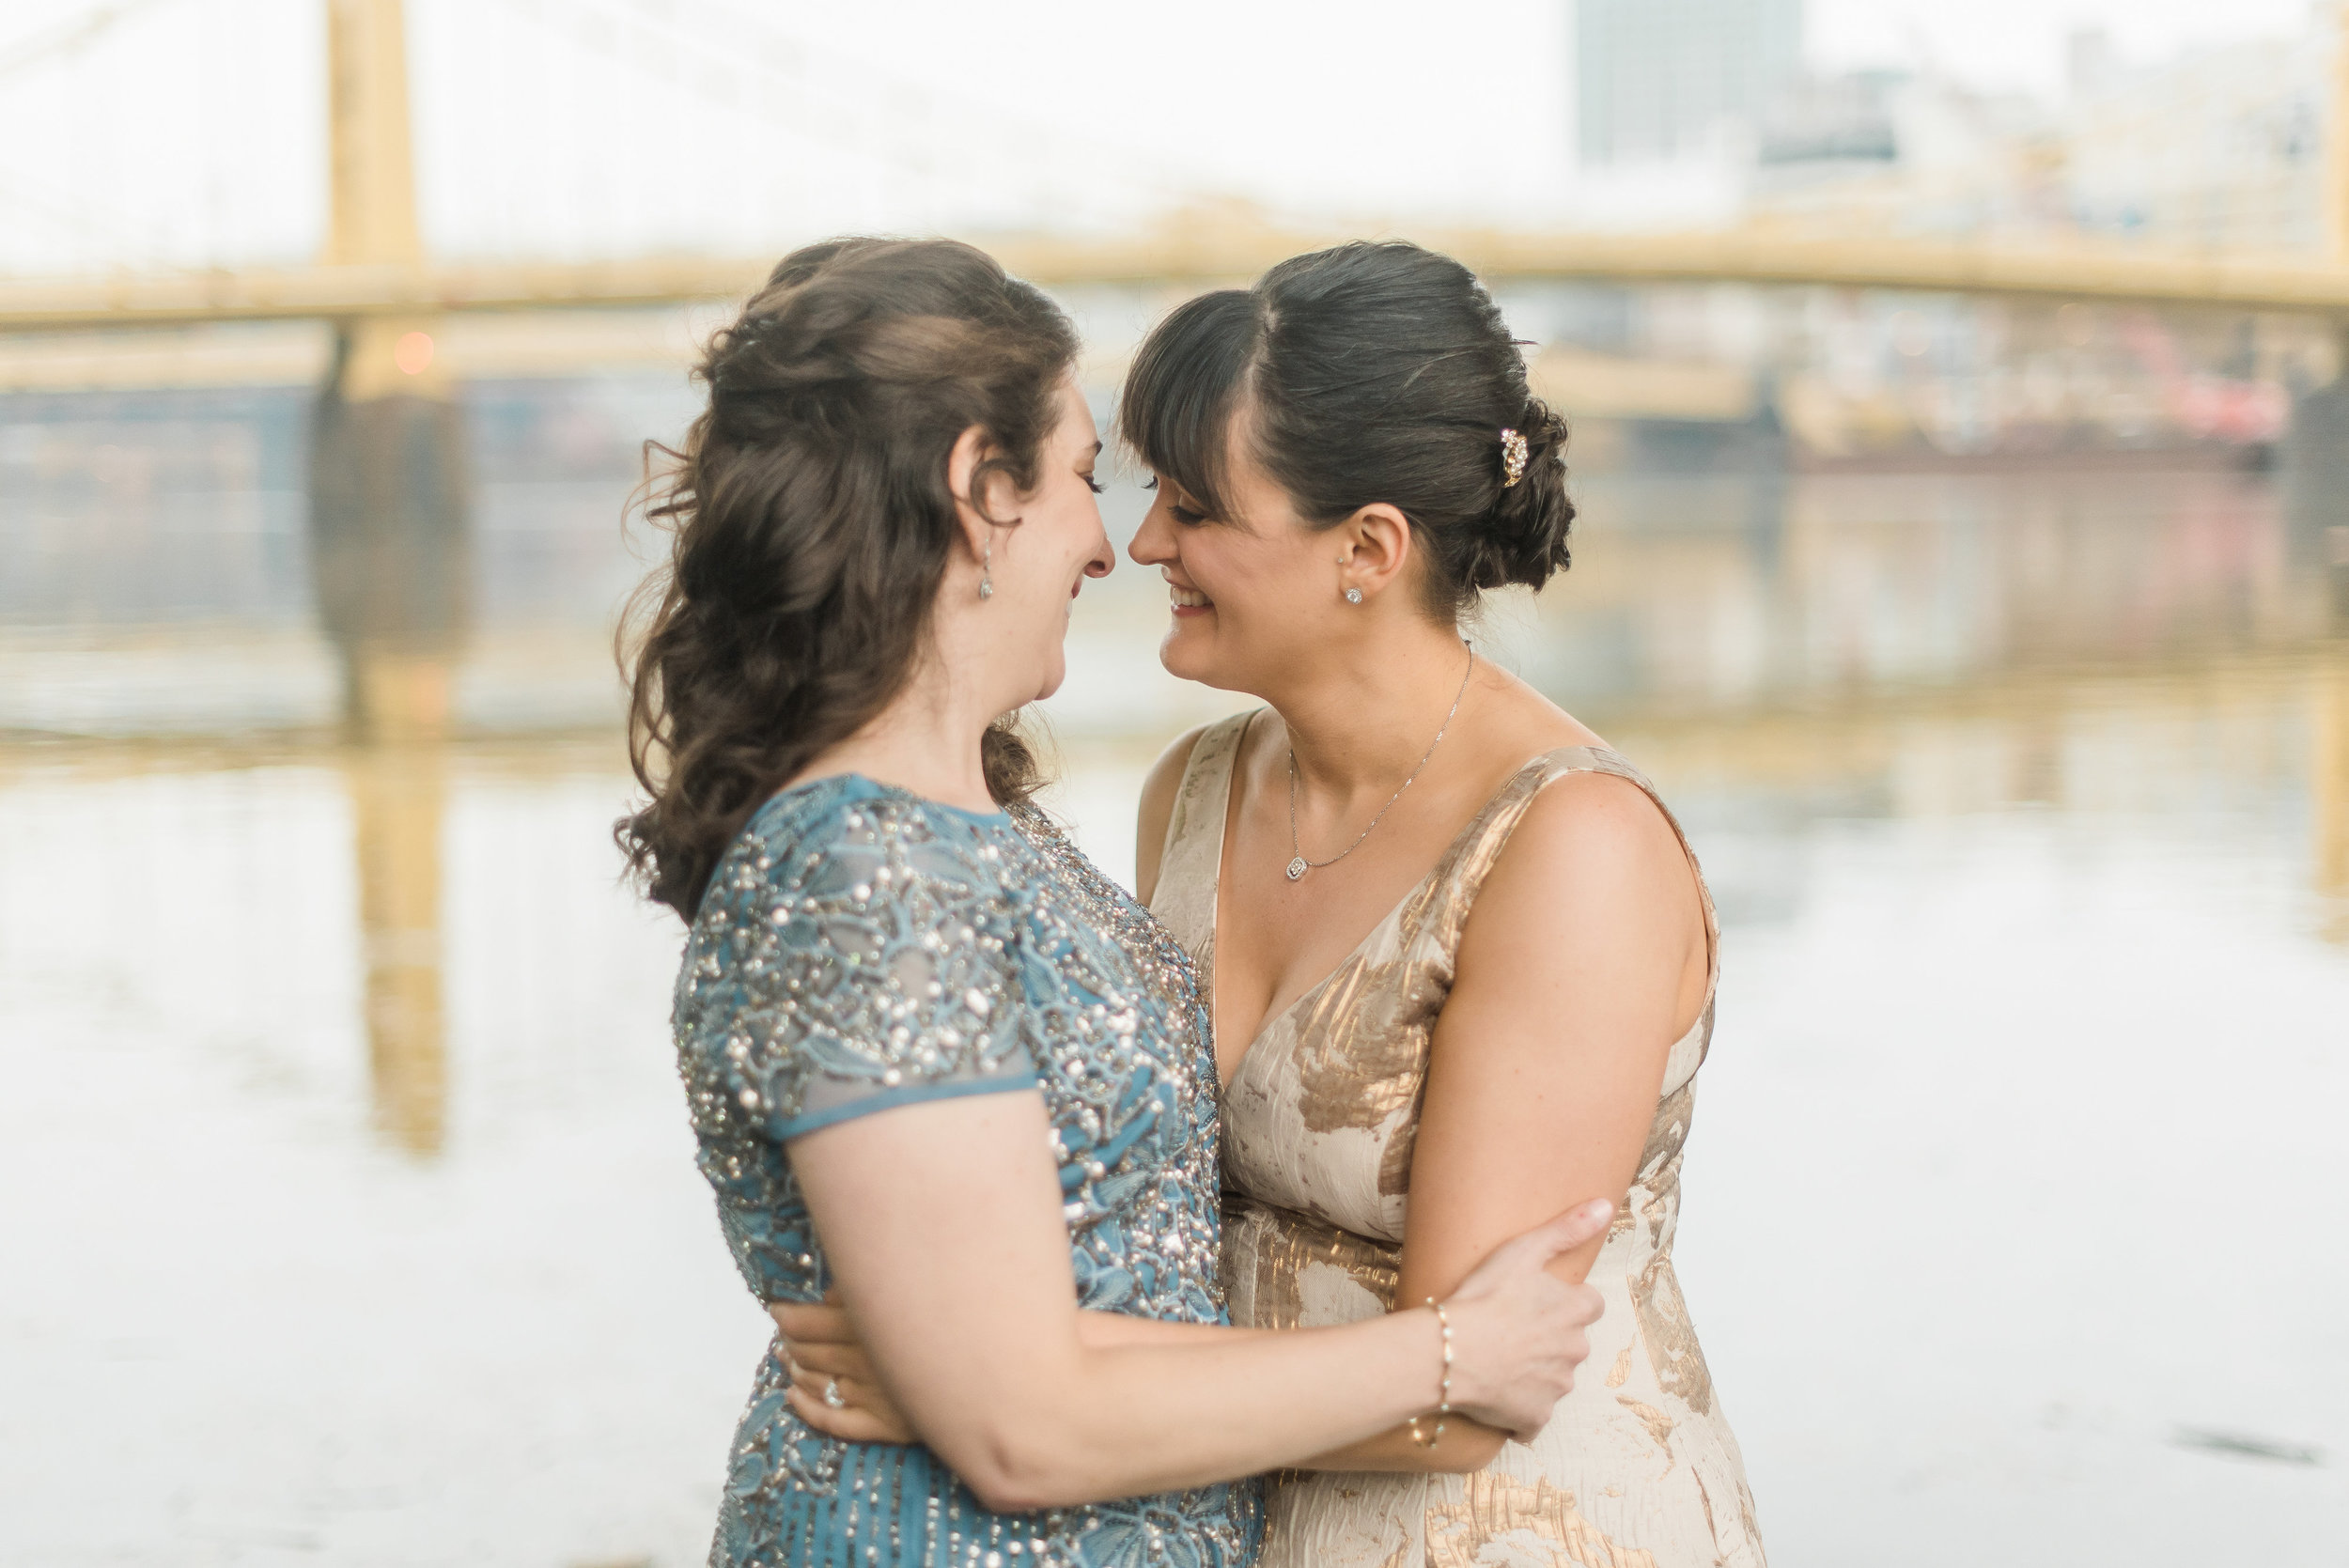 pittsburgh-wedding-photographer-lgbtqfriendly-samesex-city0004.jpg